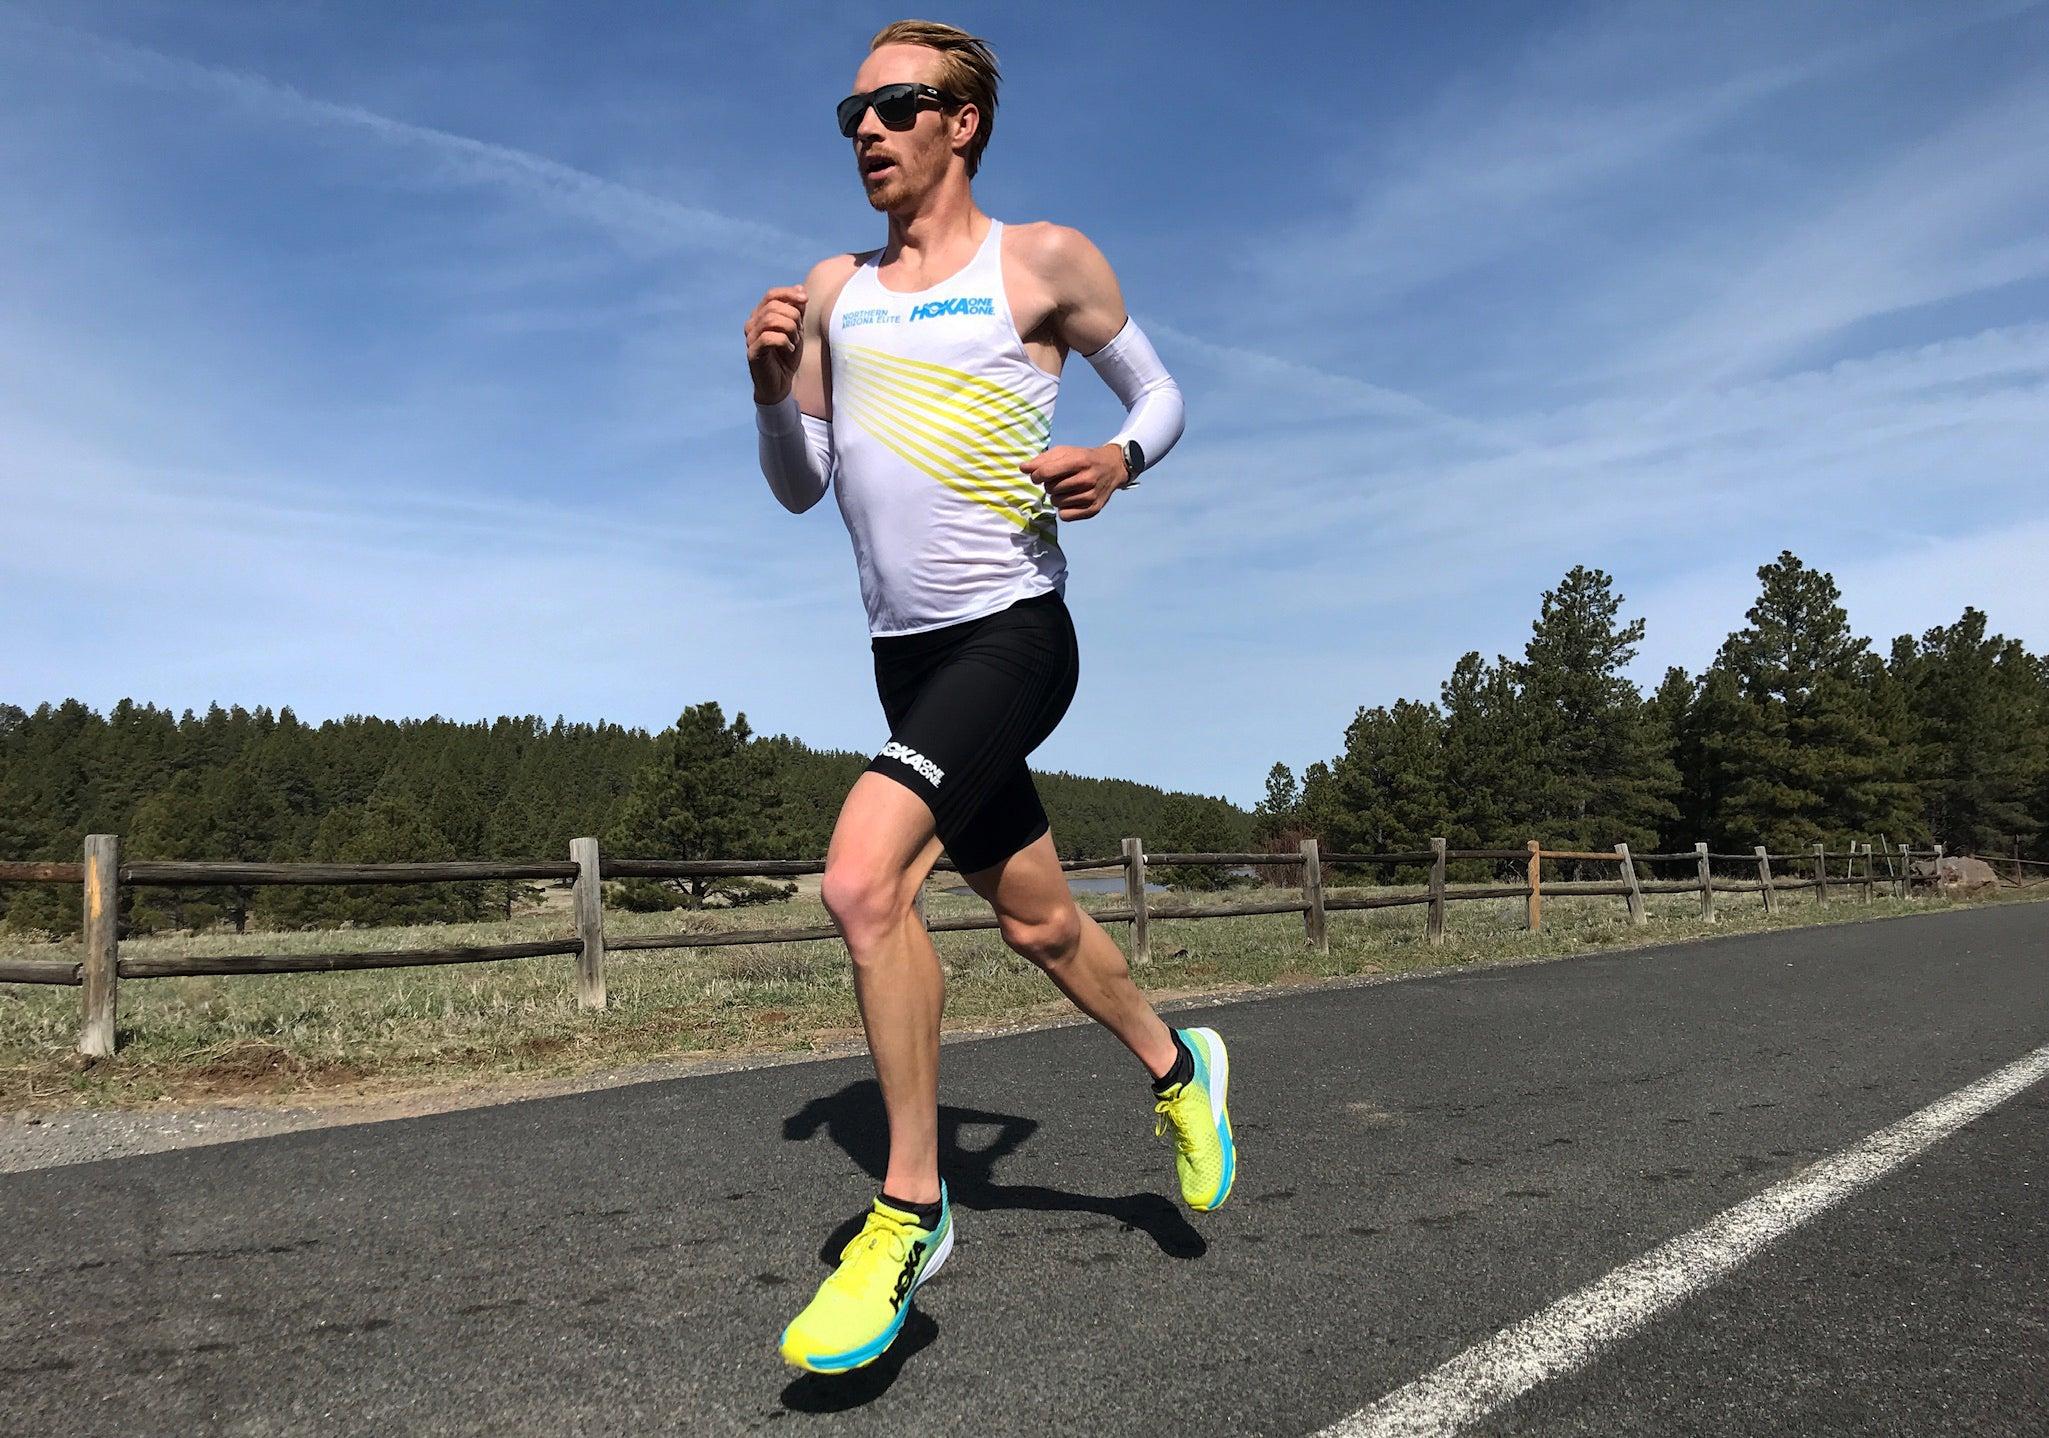 Scott Fauble NAZ Elite training in Flagstaff